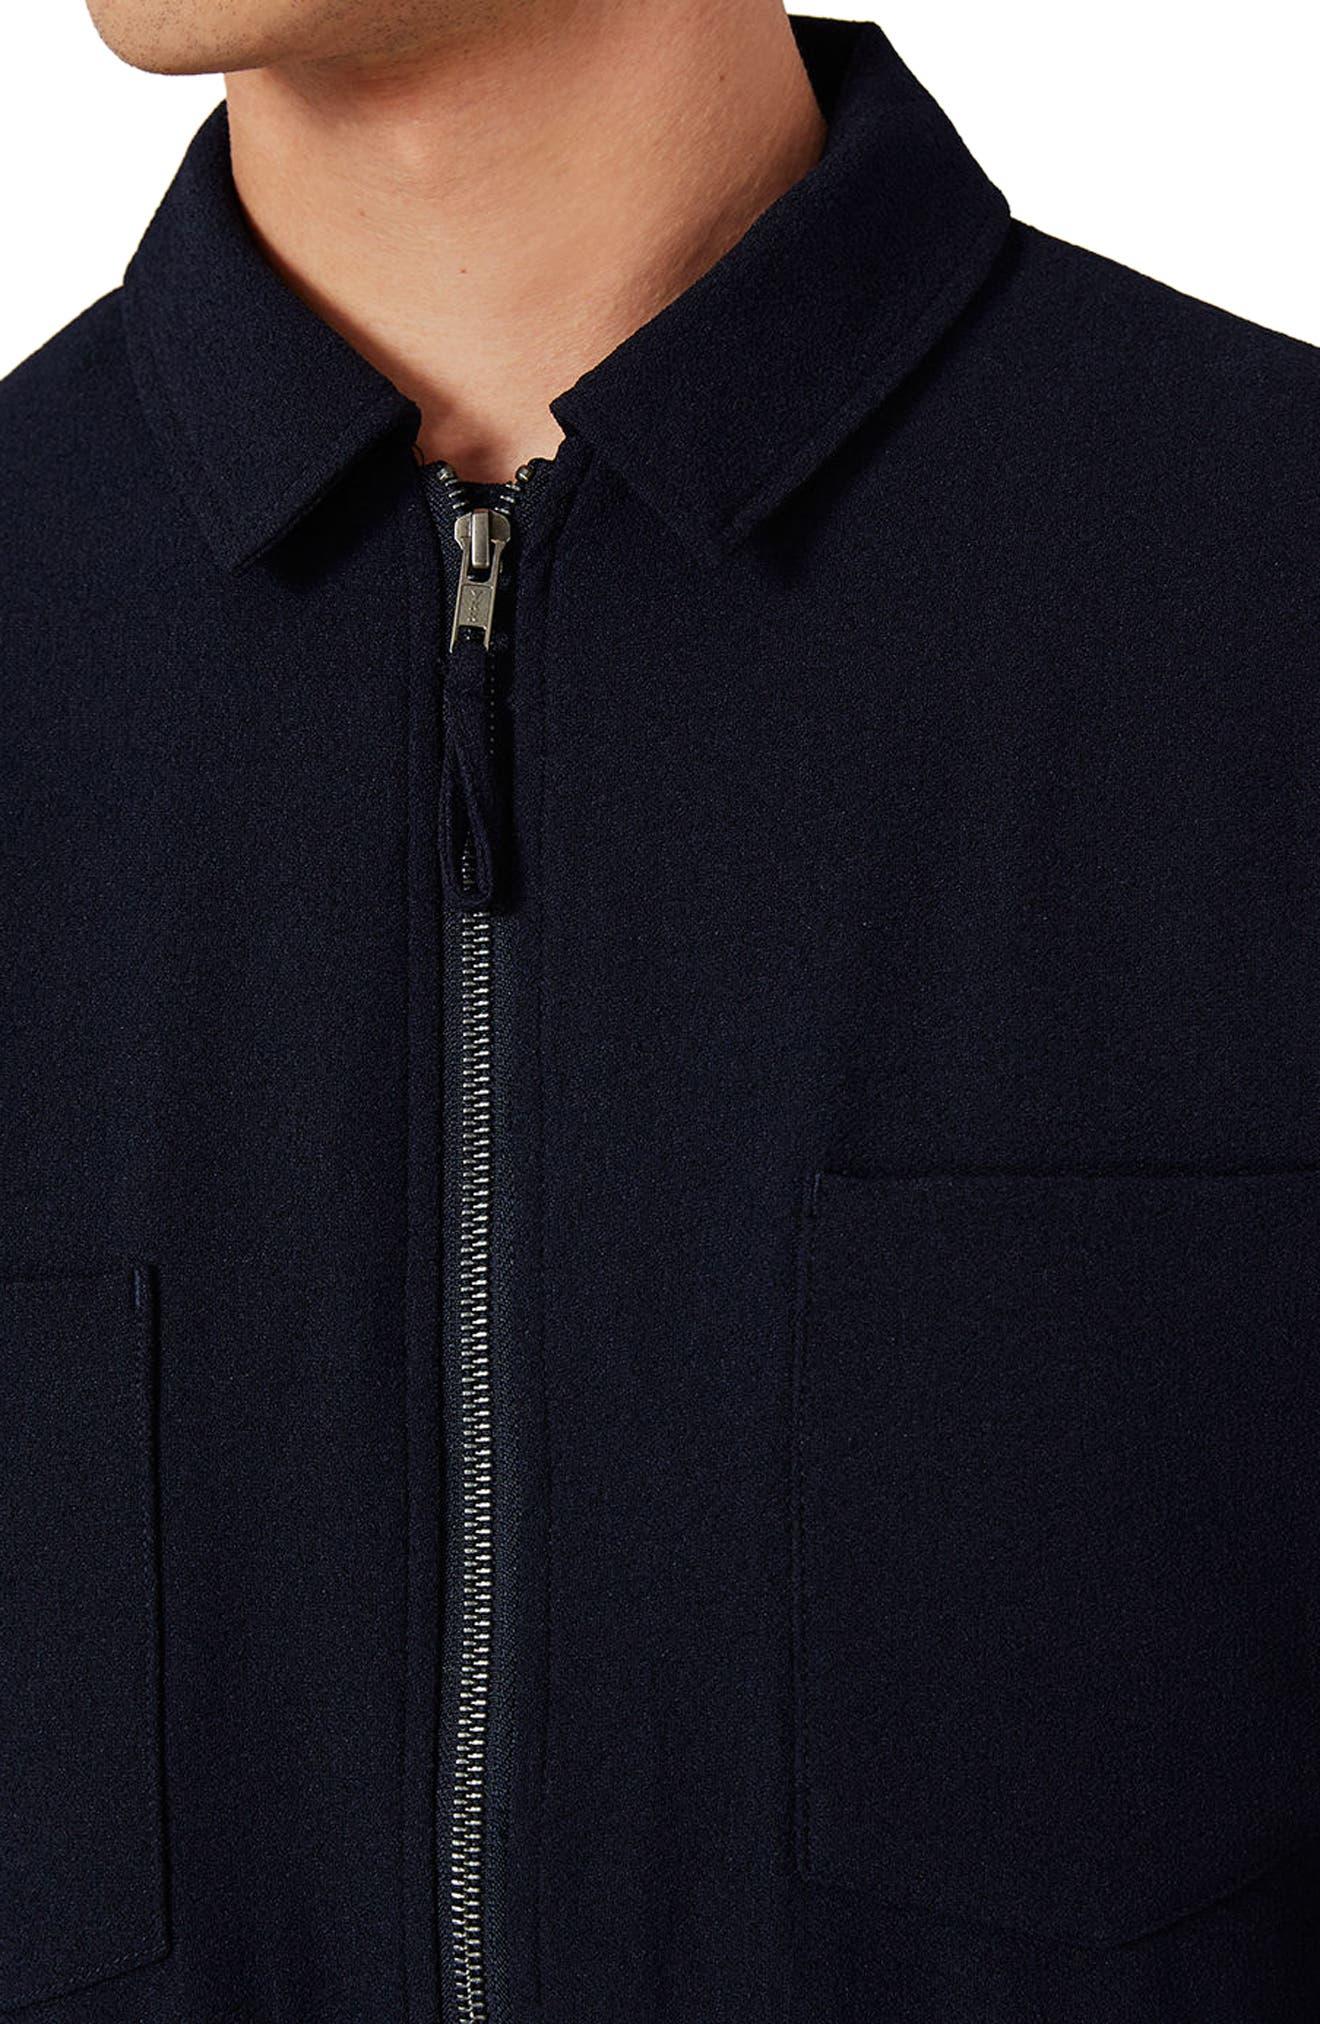 Lightweight Smart Jacket,                             Alternate thumbnail 3, color,                             410